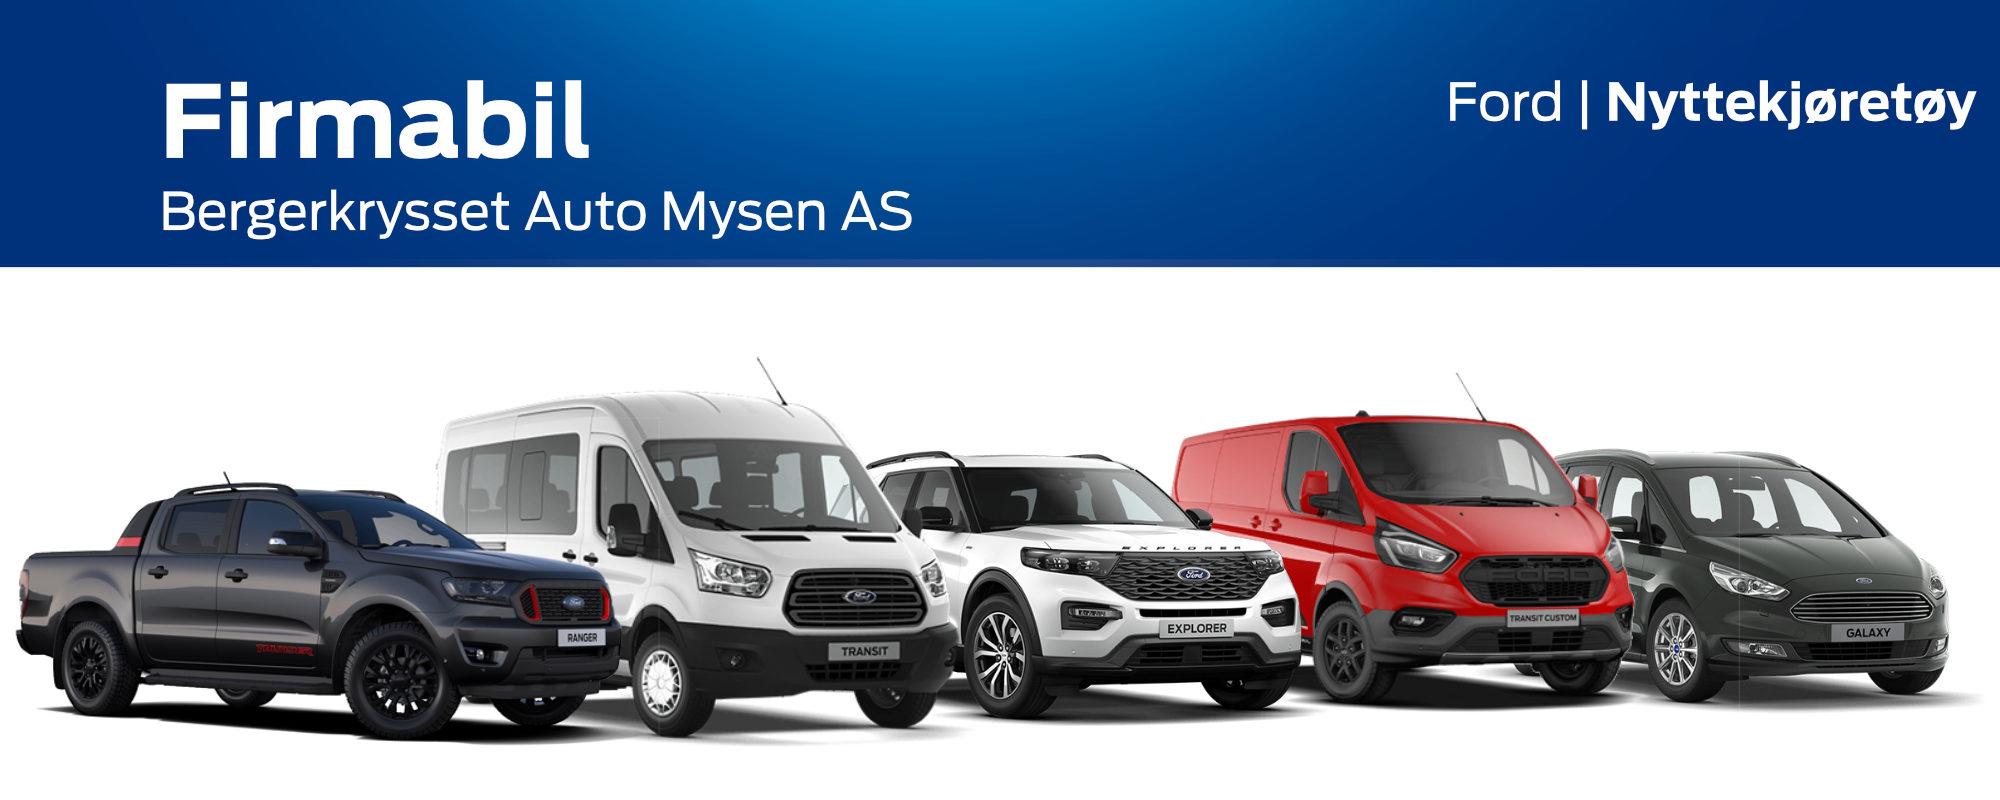 Firmabil - Bergerkrysset Auto Mysen AS